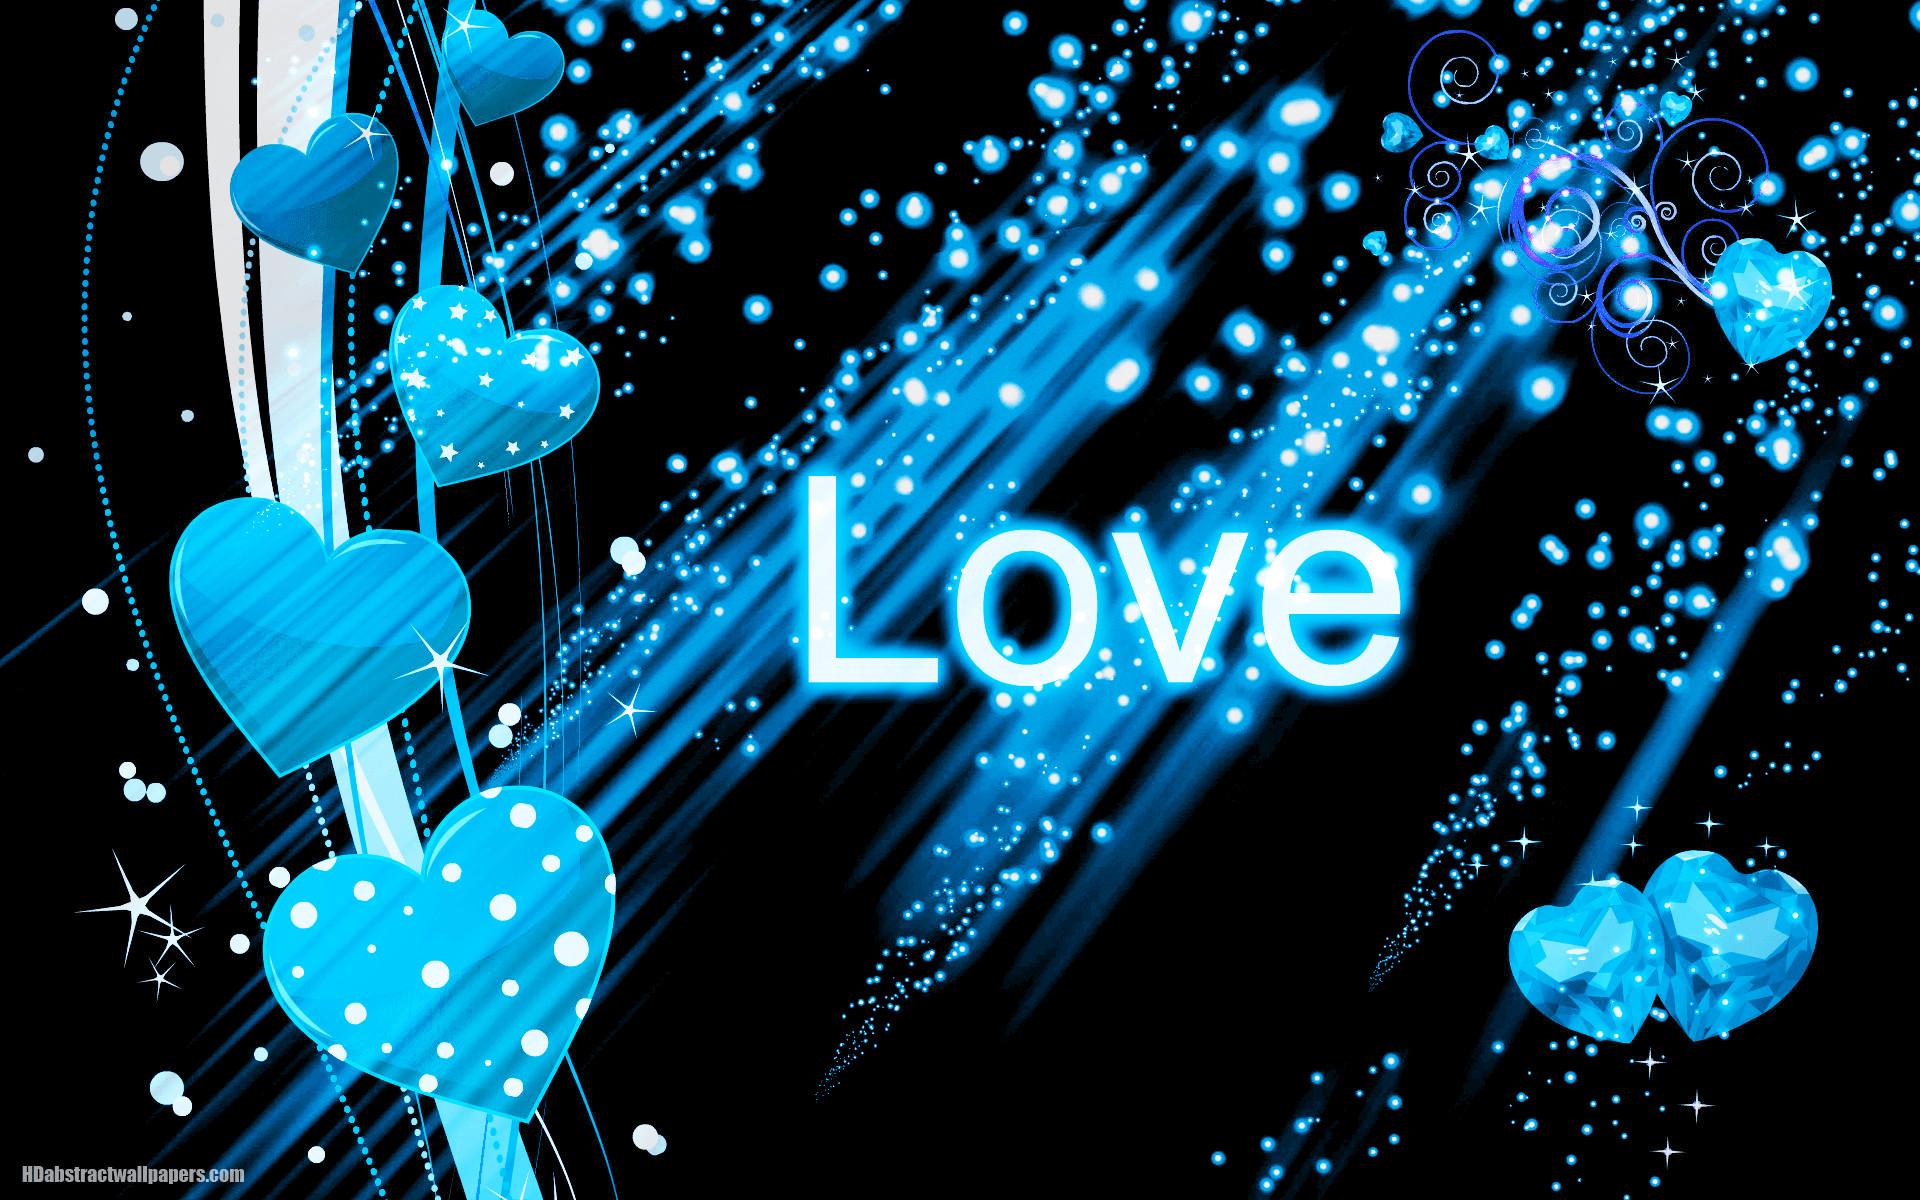 Abstract Wallpaper Black Hearts Blue 3d And Hd Wallpaper